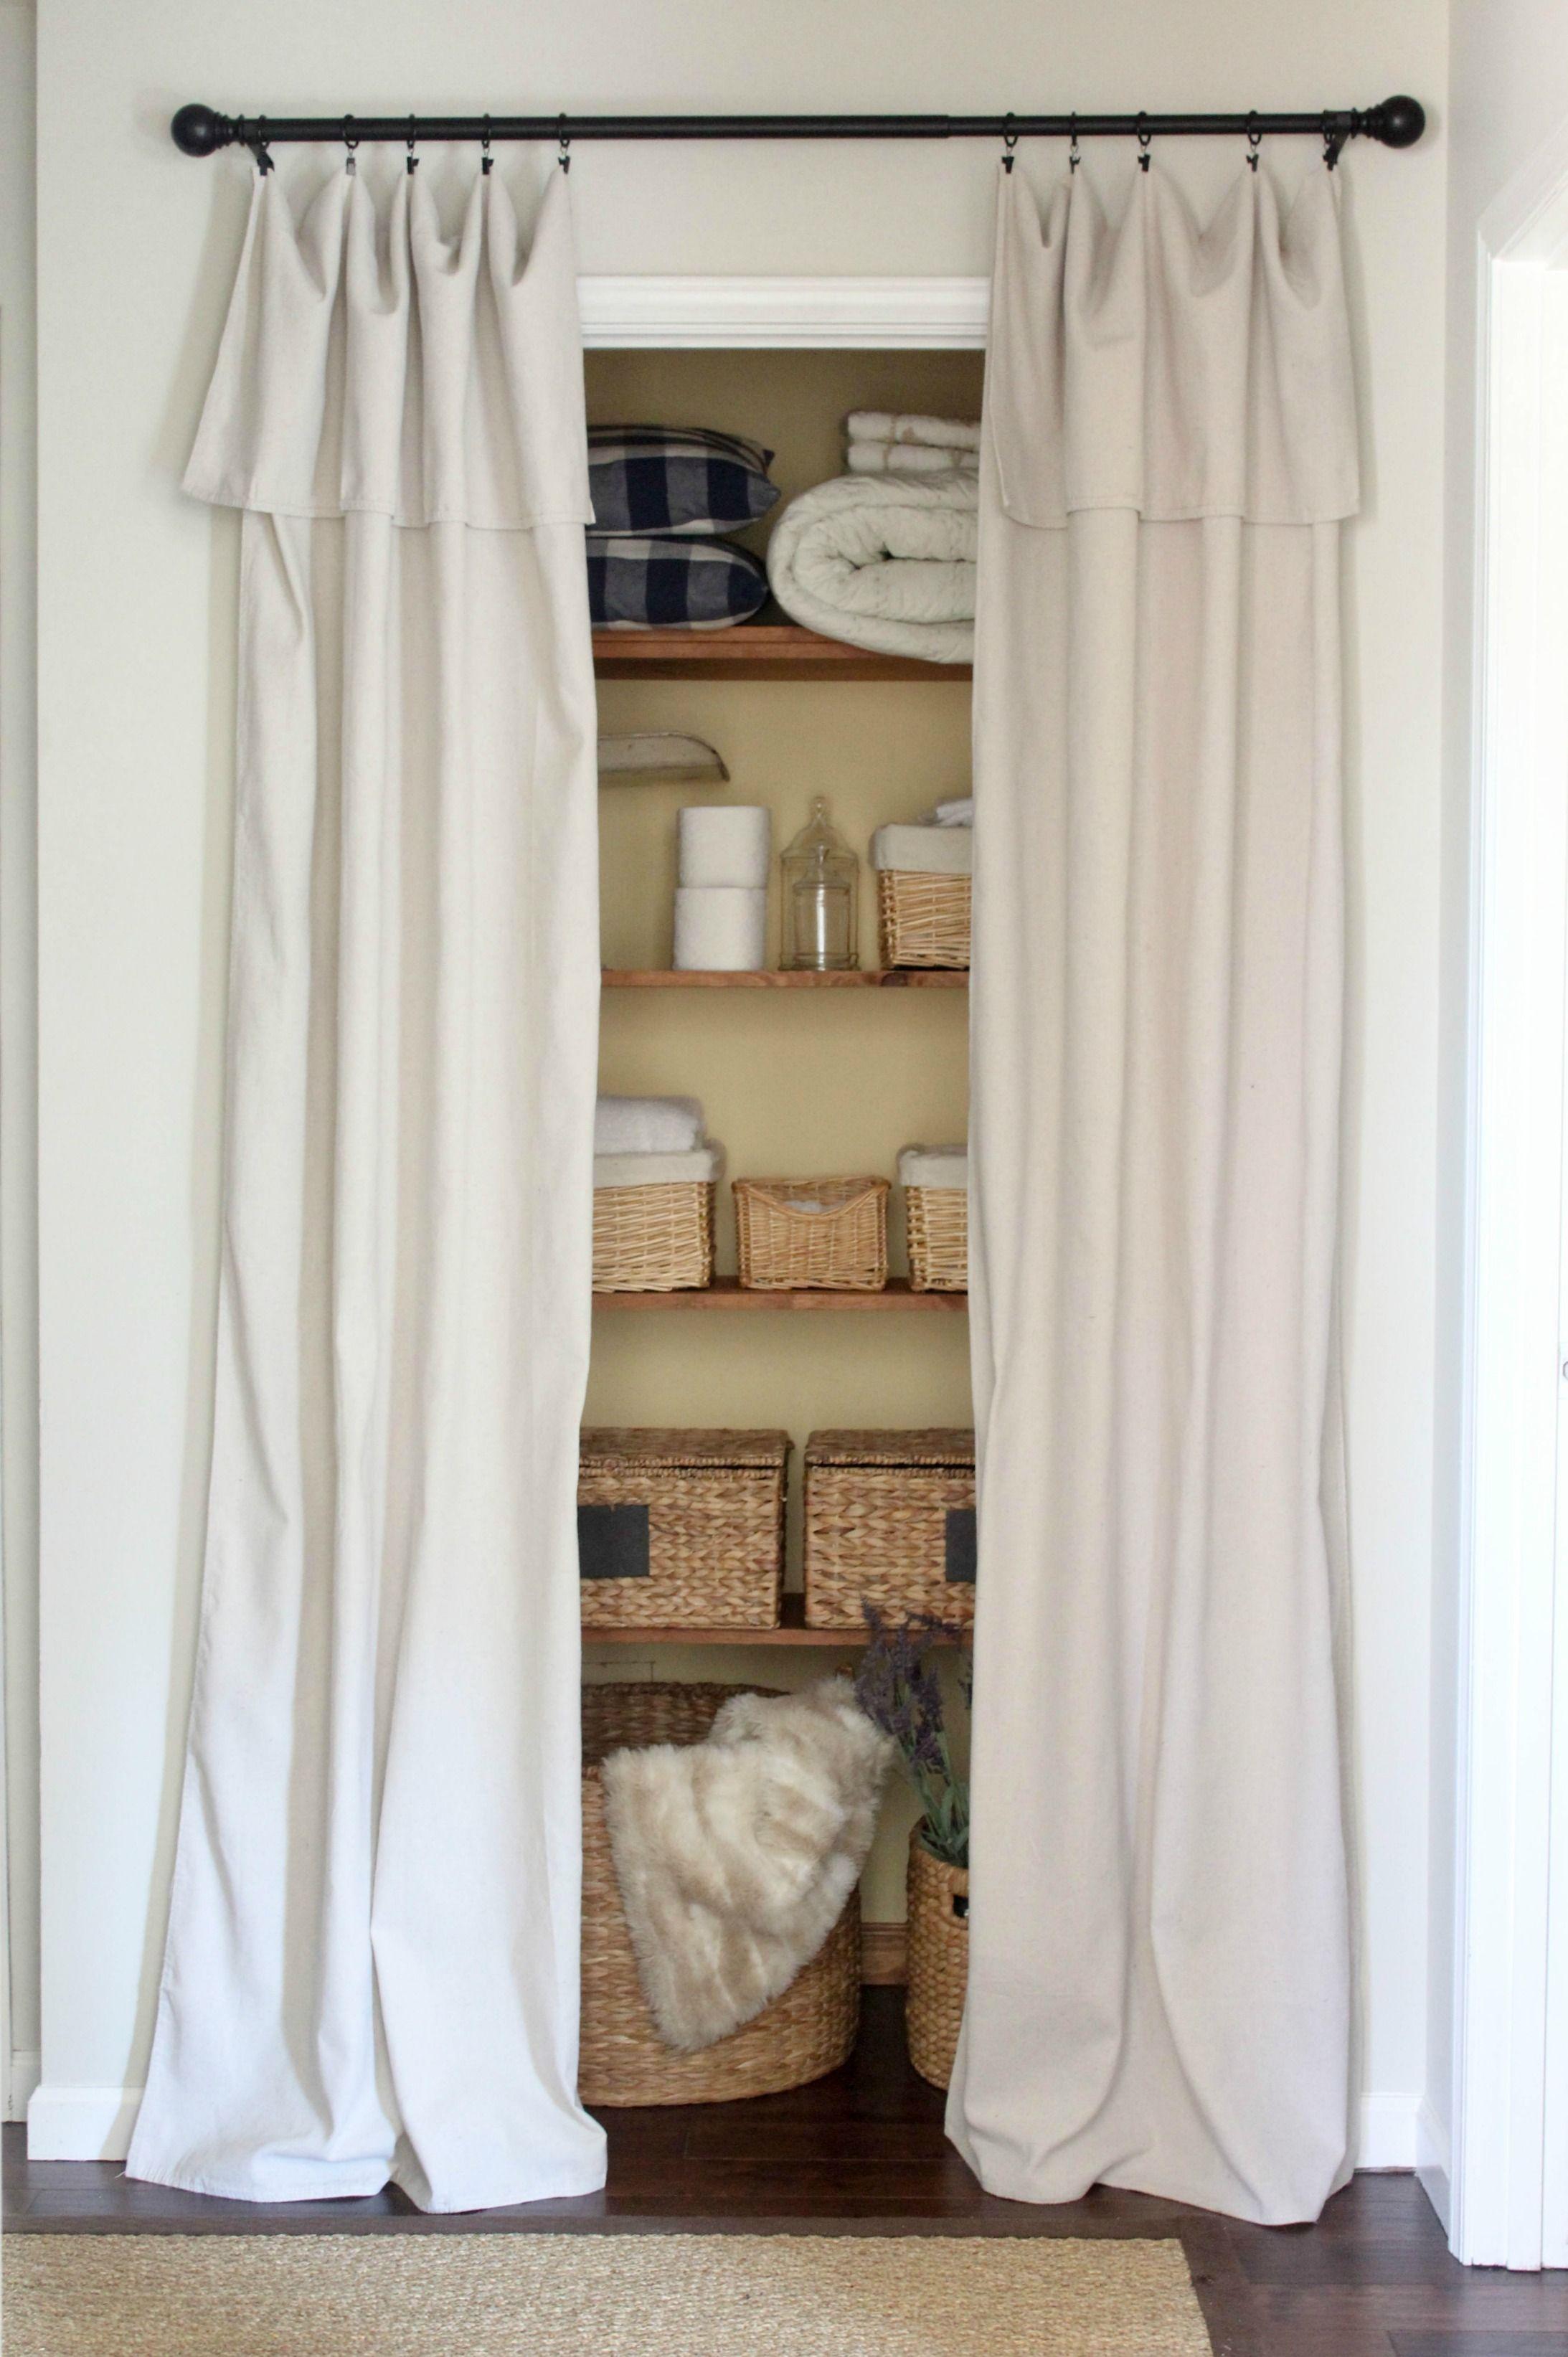 Fasjonable Closet Door Alternative - Easy Drop Cloth Curtains | kid bedrooms XJ-65